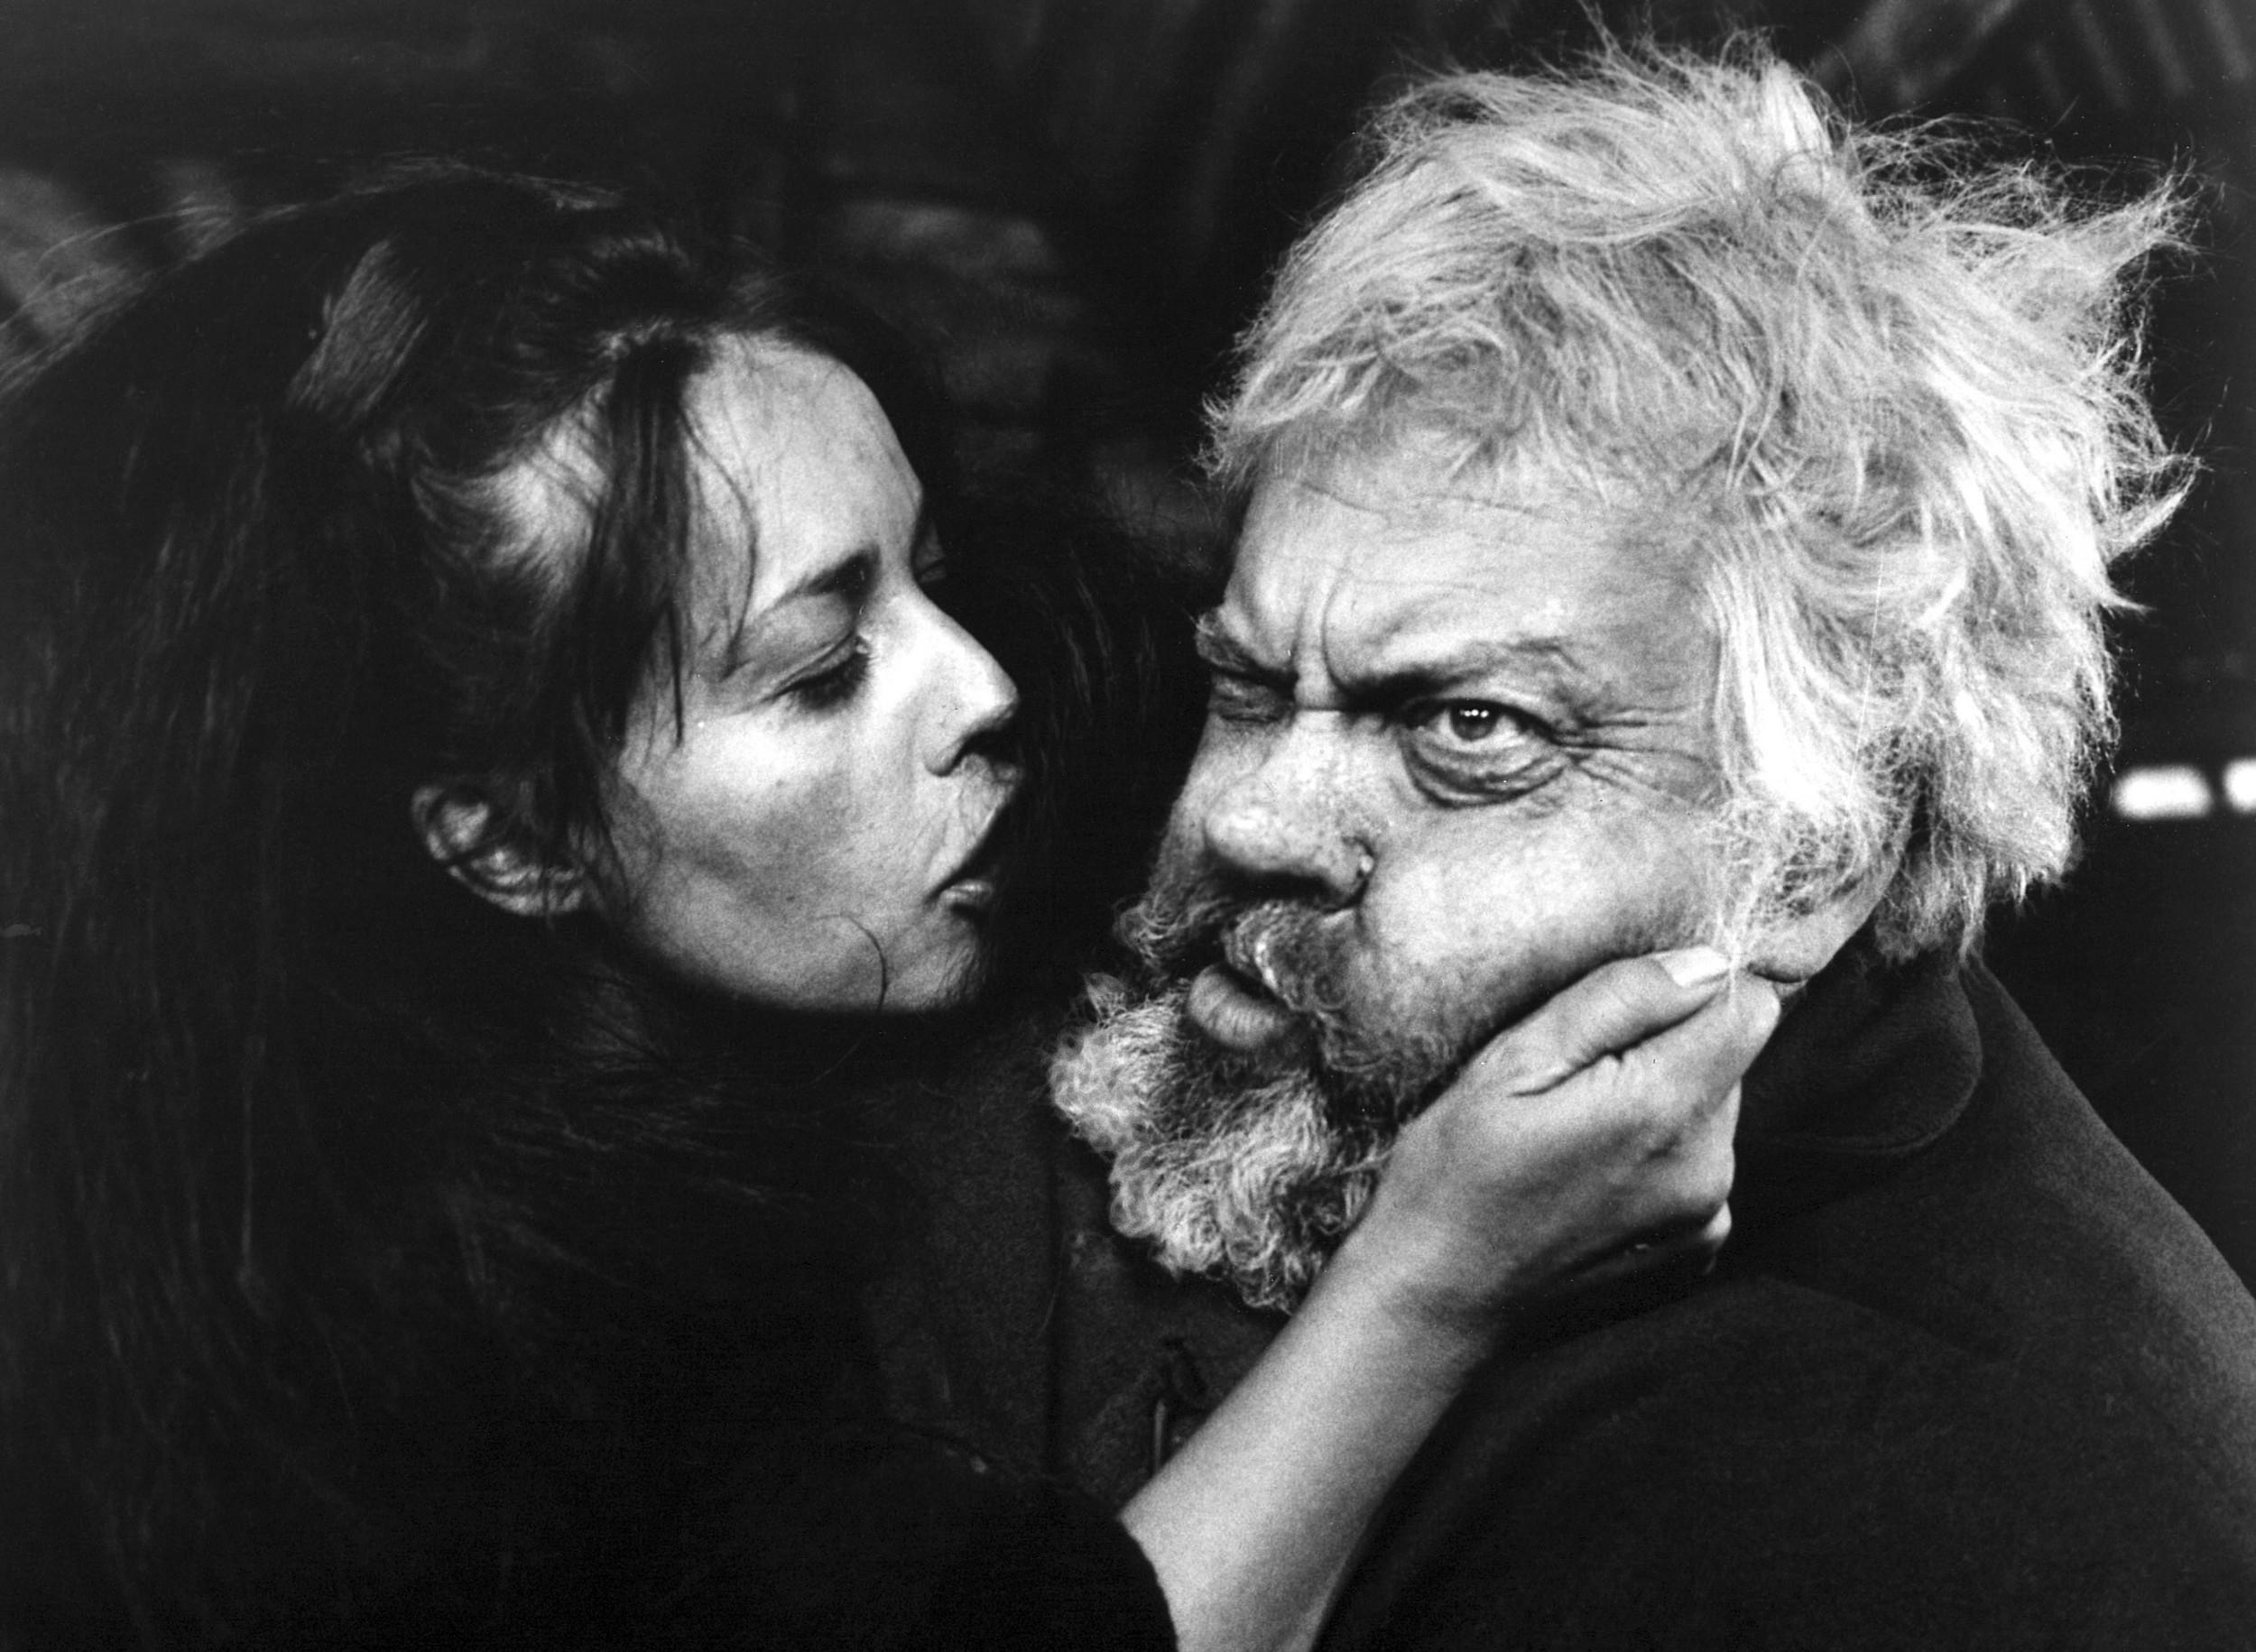 Film still from Welles' Chimes at Midnight